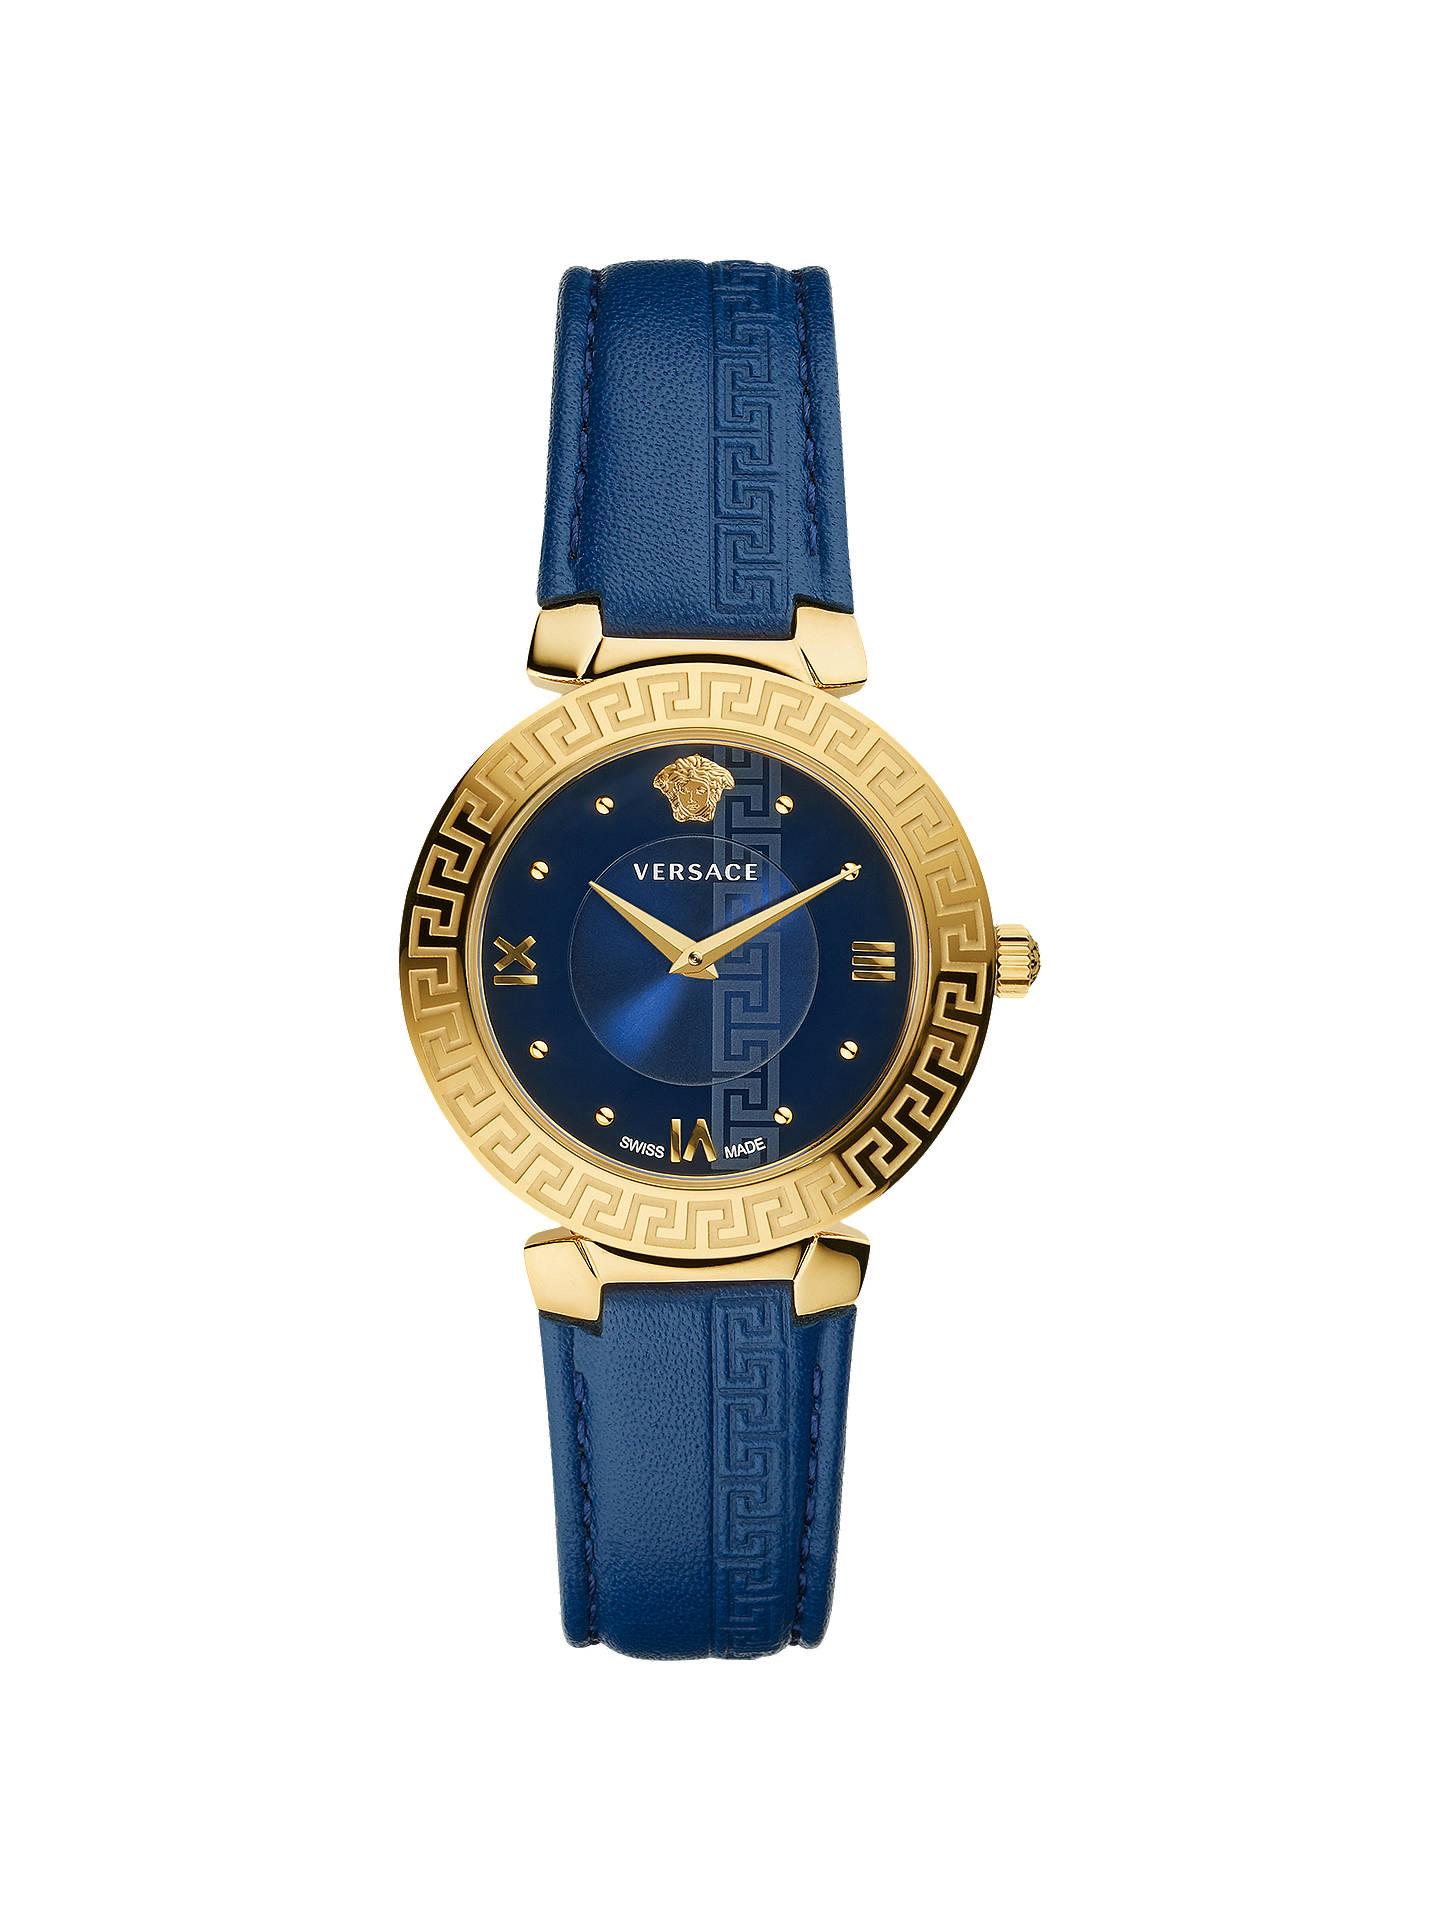 b34fb41133 Versace V16040017 Women's Daphnis Leather Strap Watch, Blue